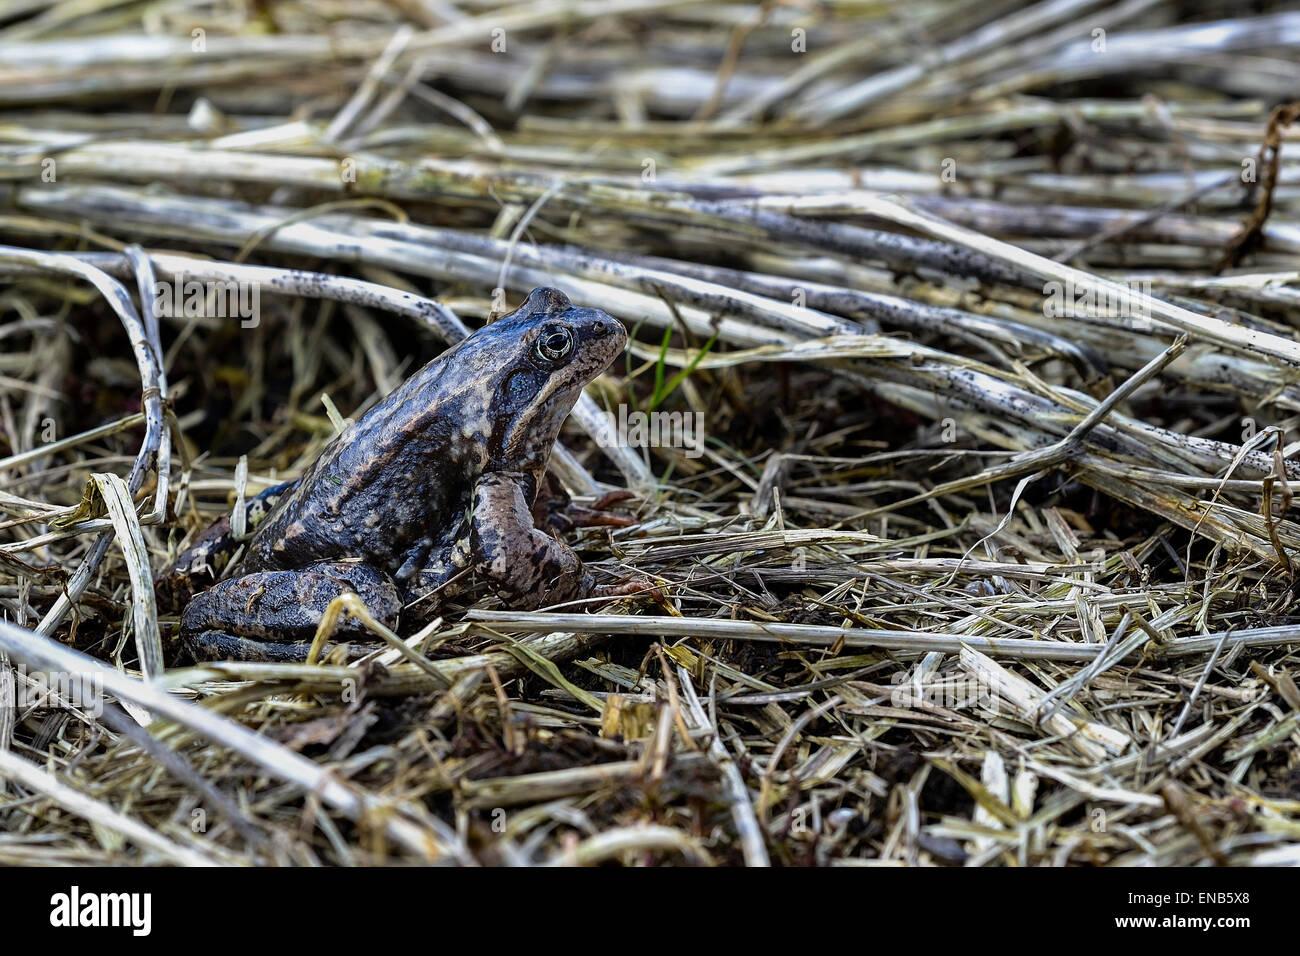 rana temporaria, common frog - Stock Image